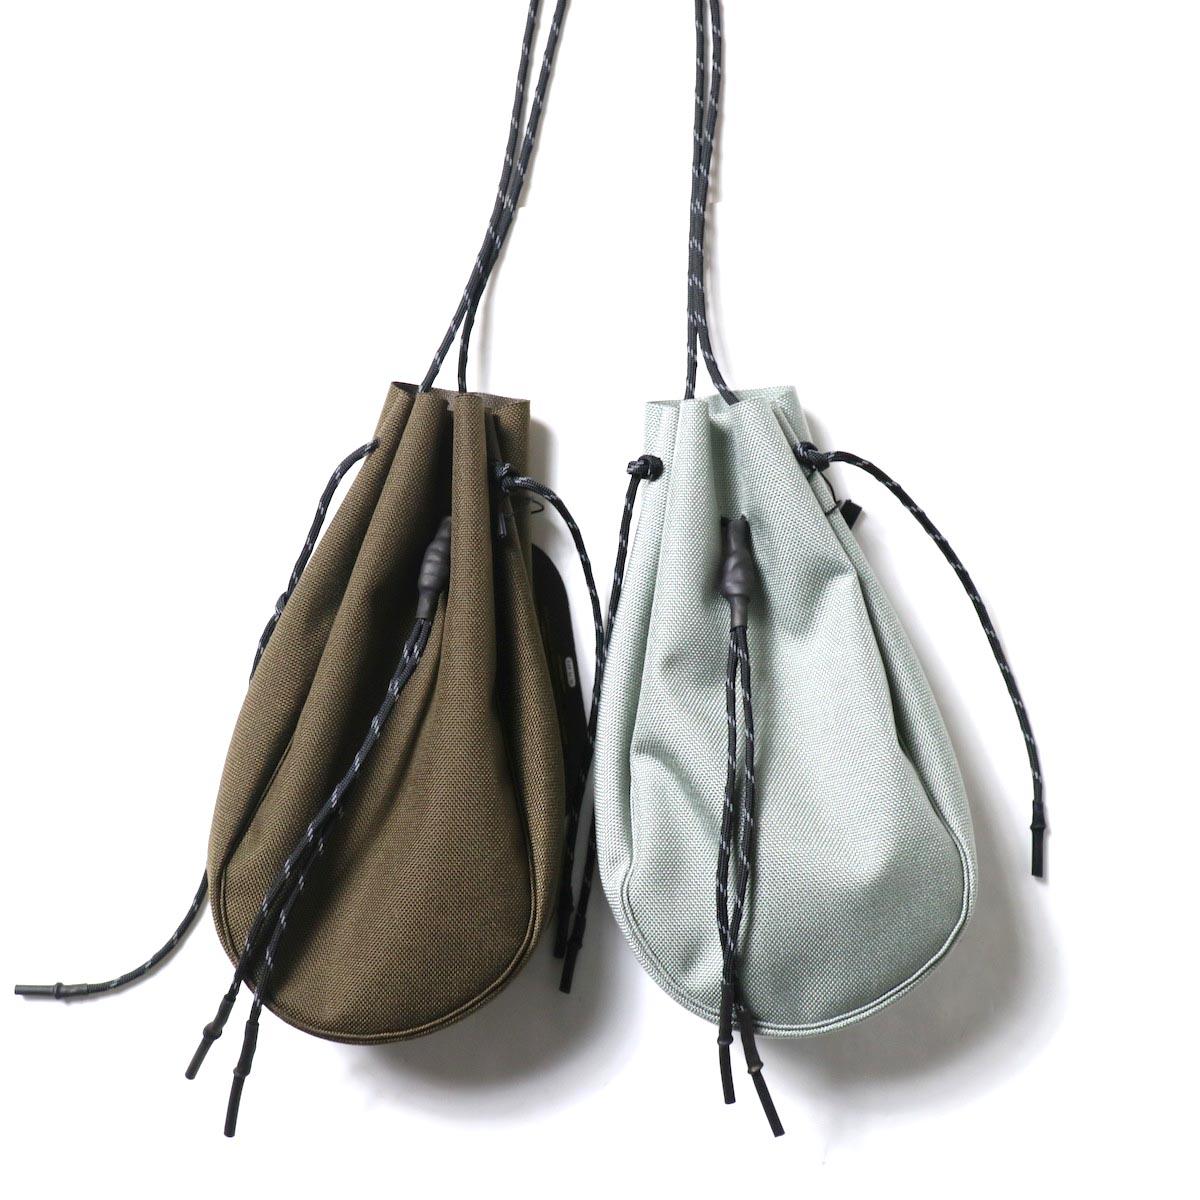 吉岡衣料店 / drawstring bag -S-. (左:Brown / 右:gray)